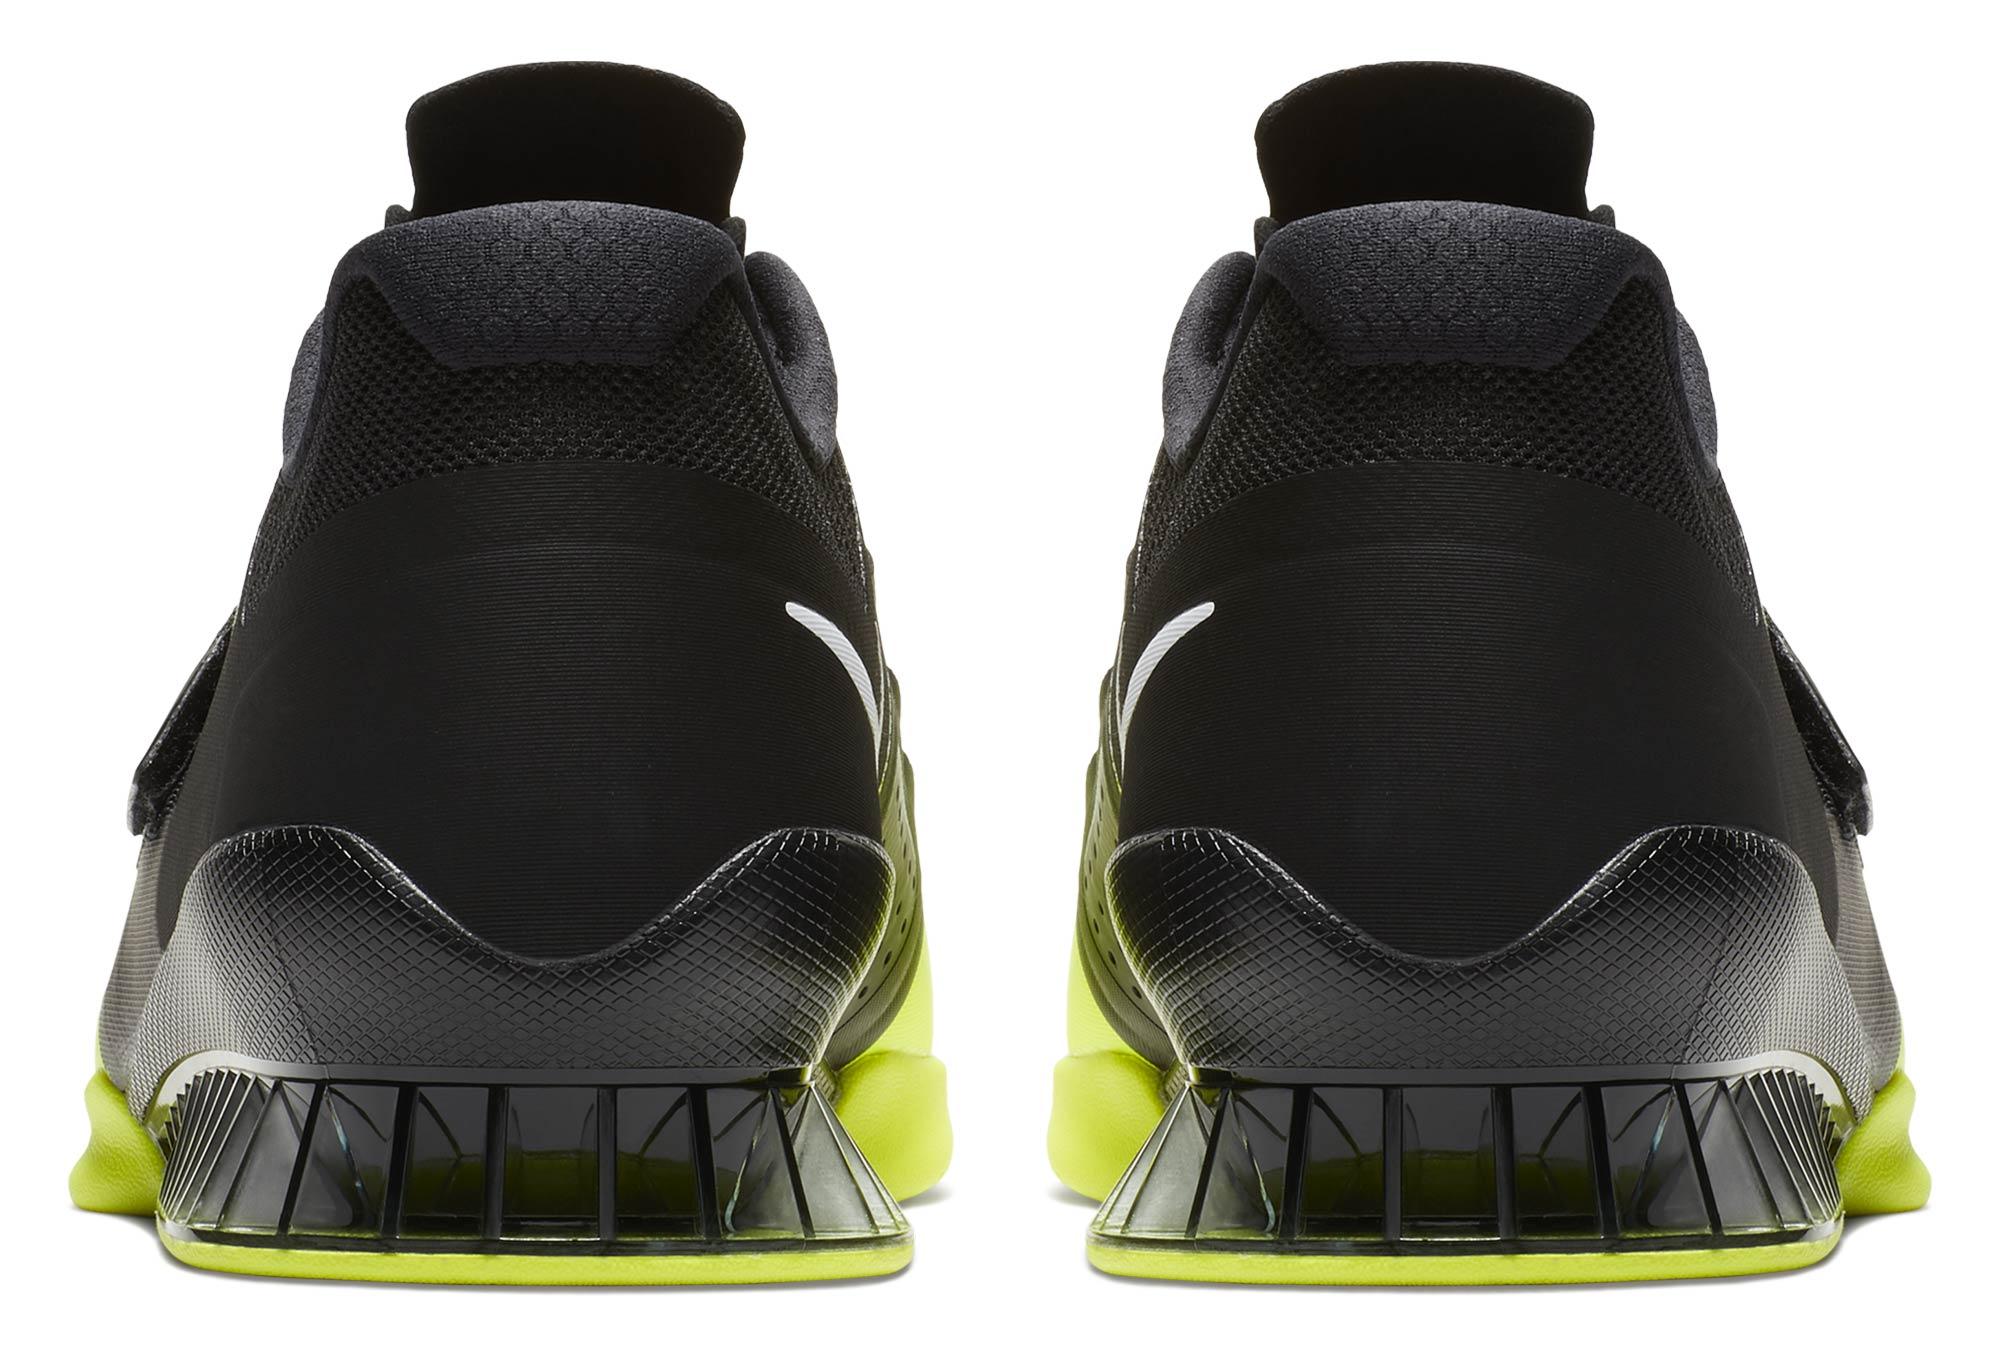 chaussures de cross training nike romaleos 3 noir jaune fluo. Black Bedroom Furniture Sets. Home Design Ideas